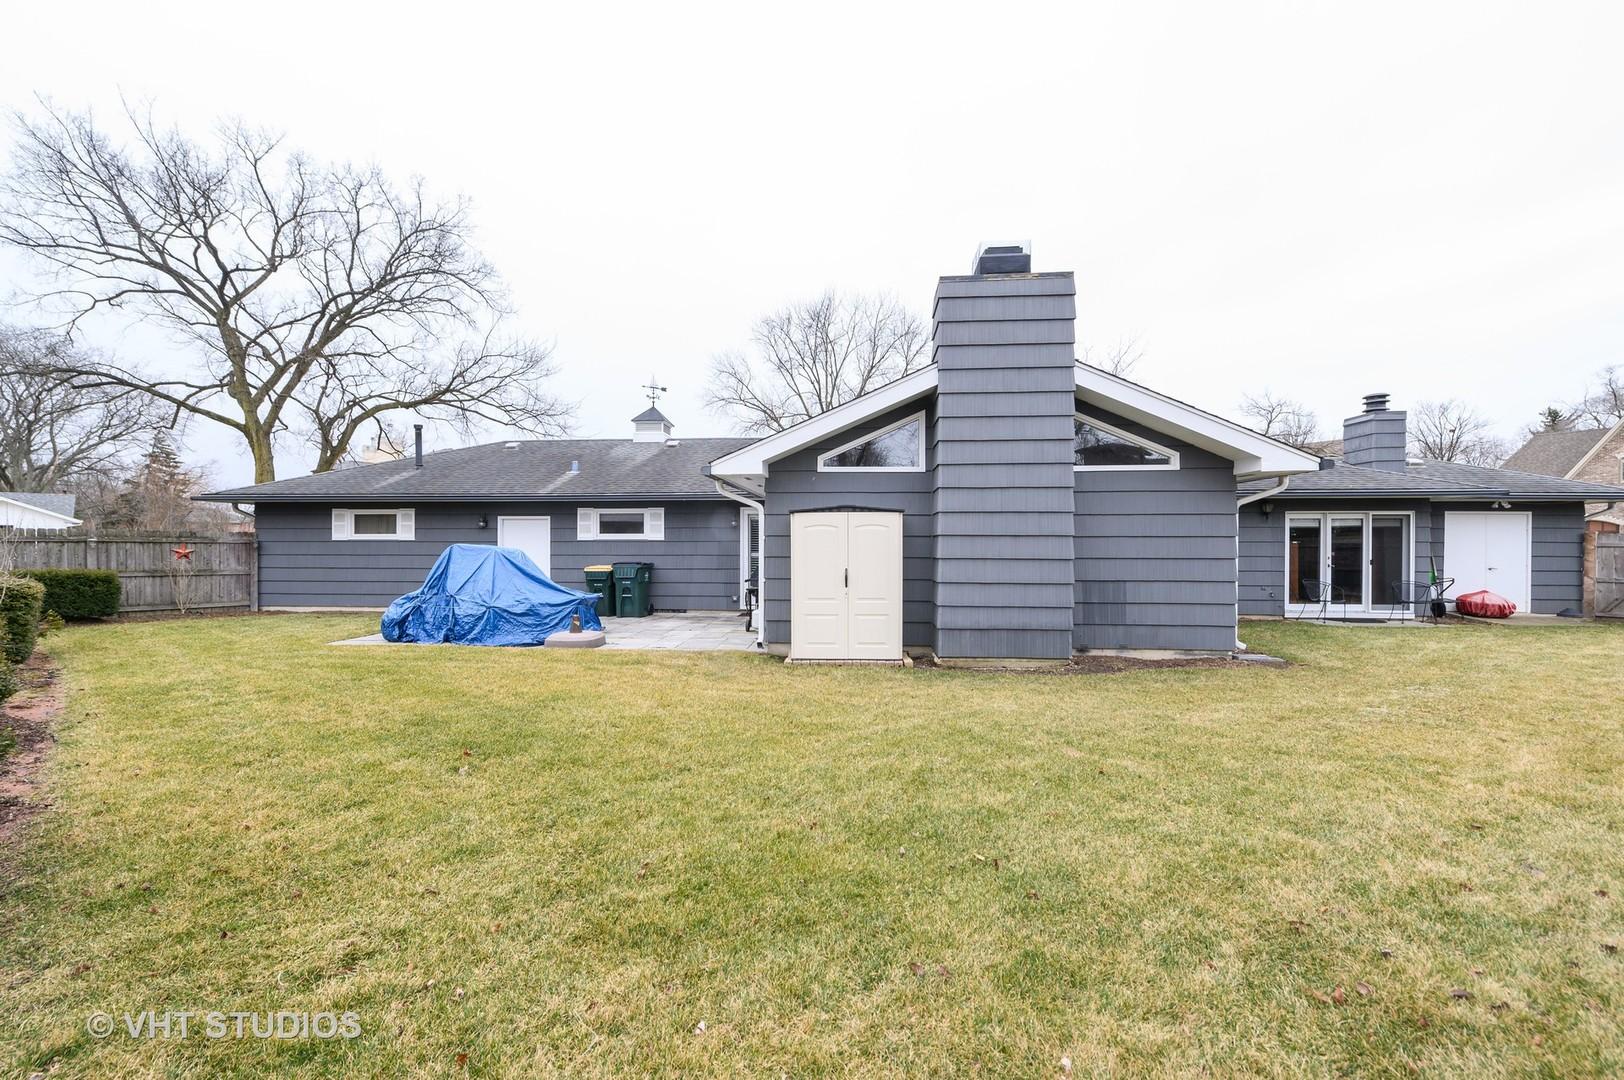 5547 South Monroe, Hinsdale, Illinois, 60521